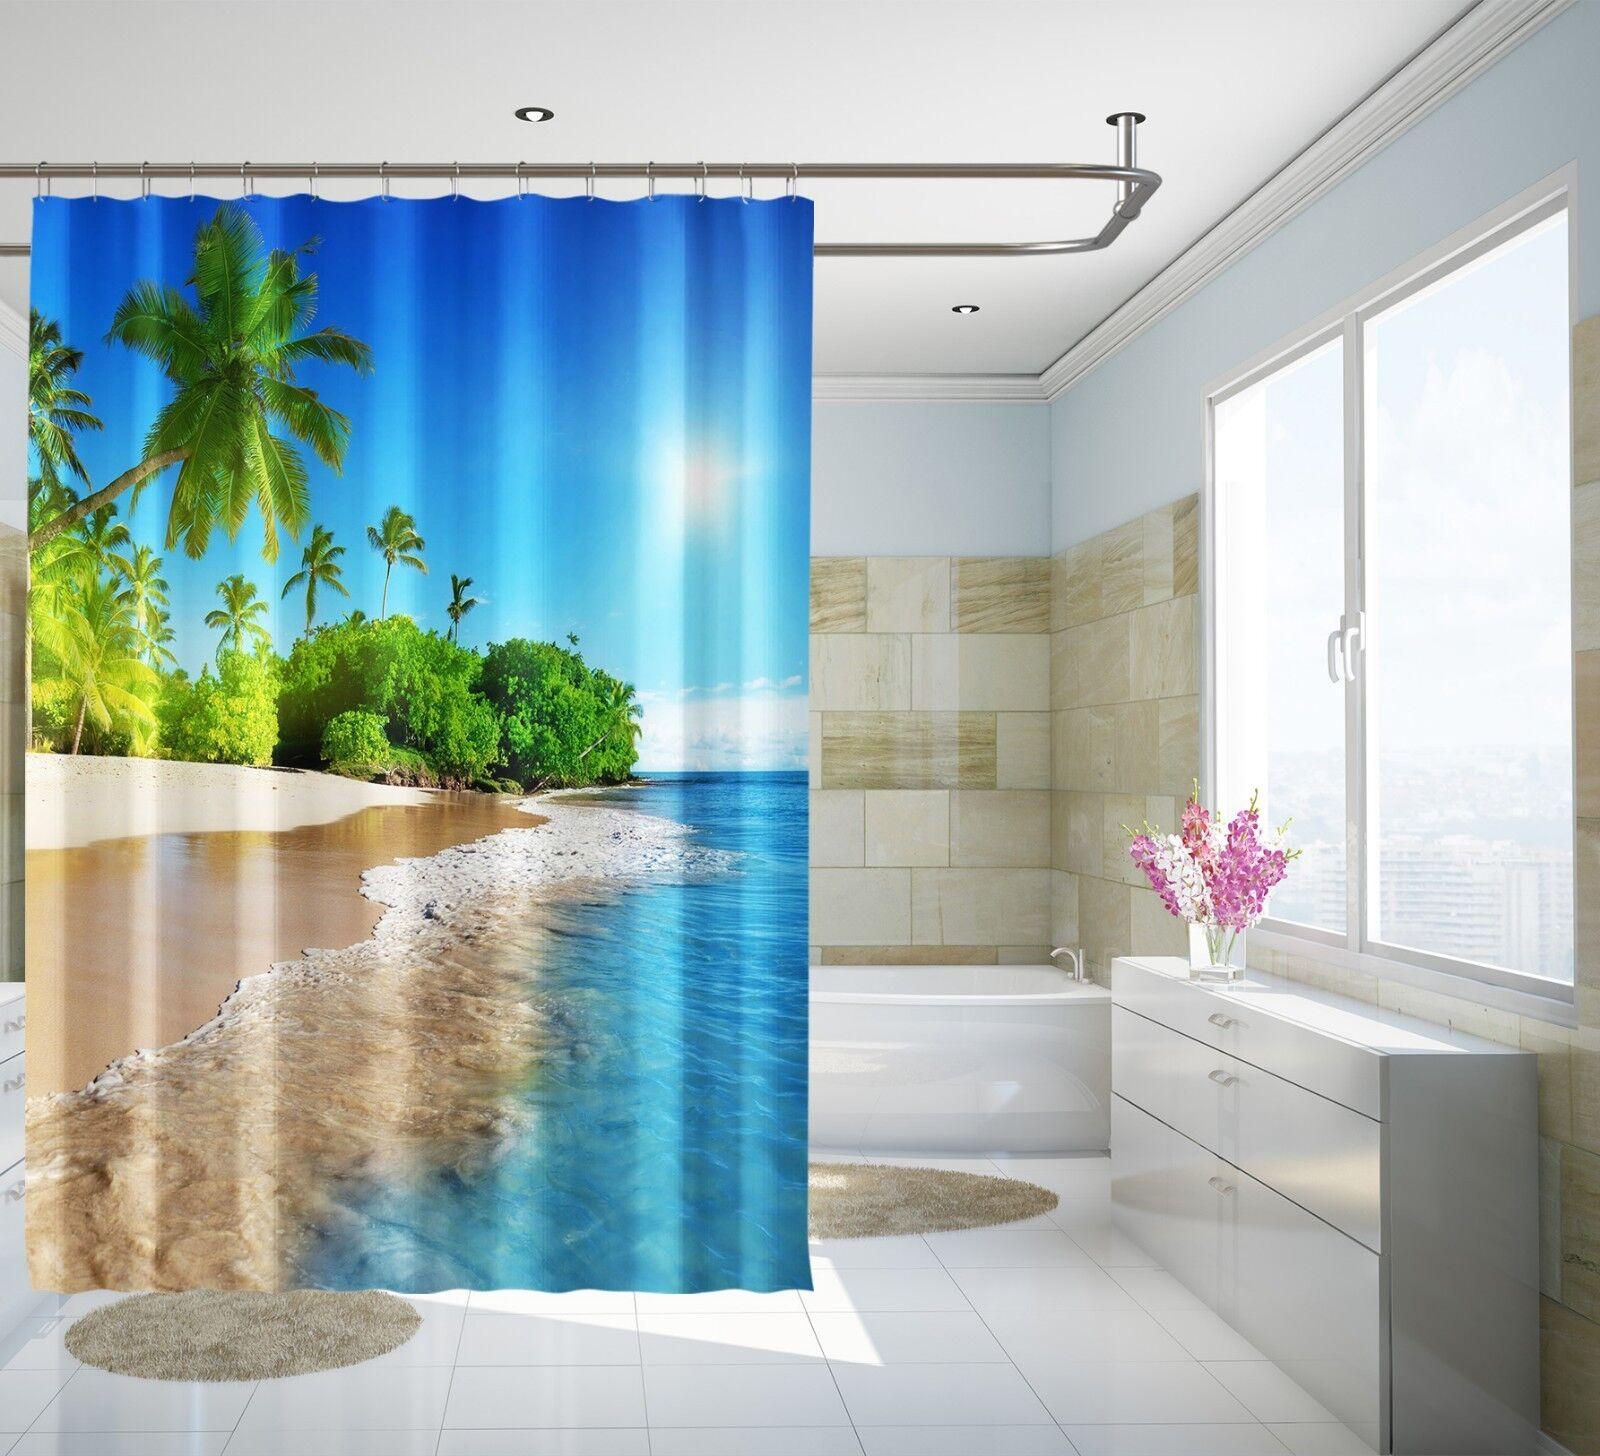 3D Baum Strand 7 Duschvorhang Duschvorhang Duschvorhang Wasserdicht Faser Bad Daheim Windows Toilette DE   Schönes Aussehen  9386c6